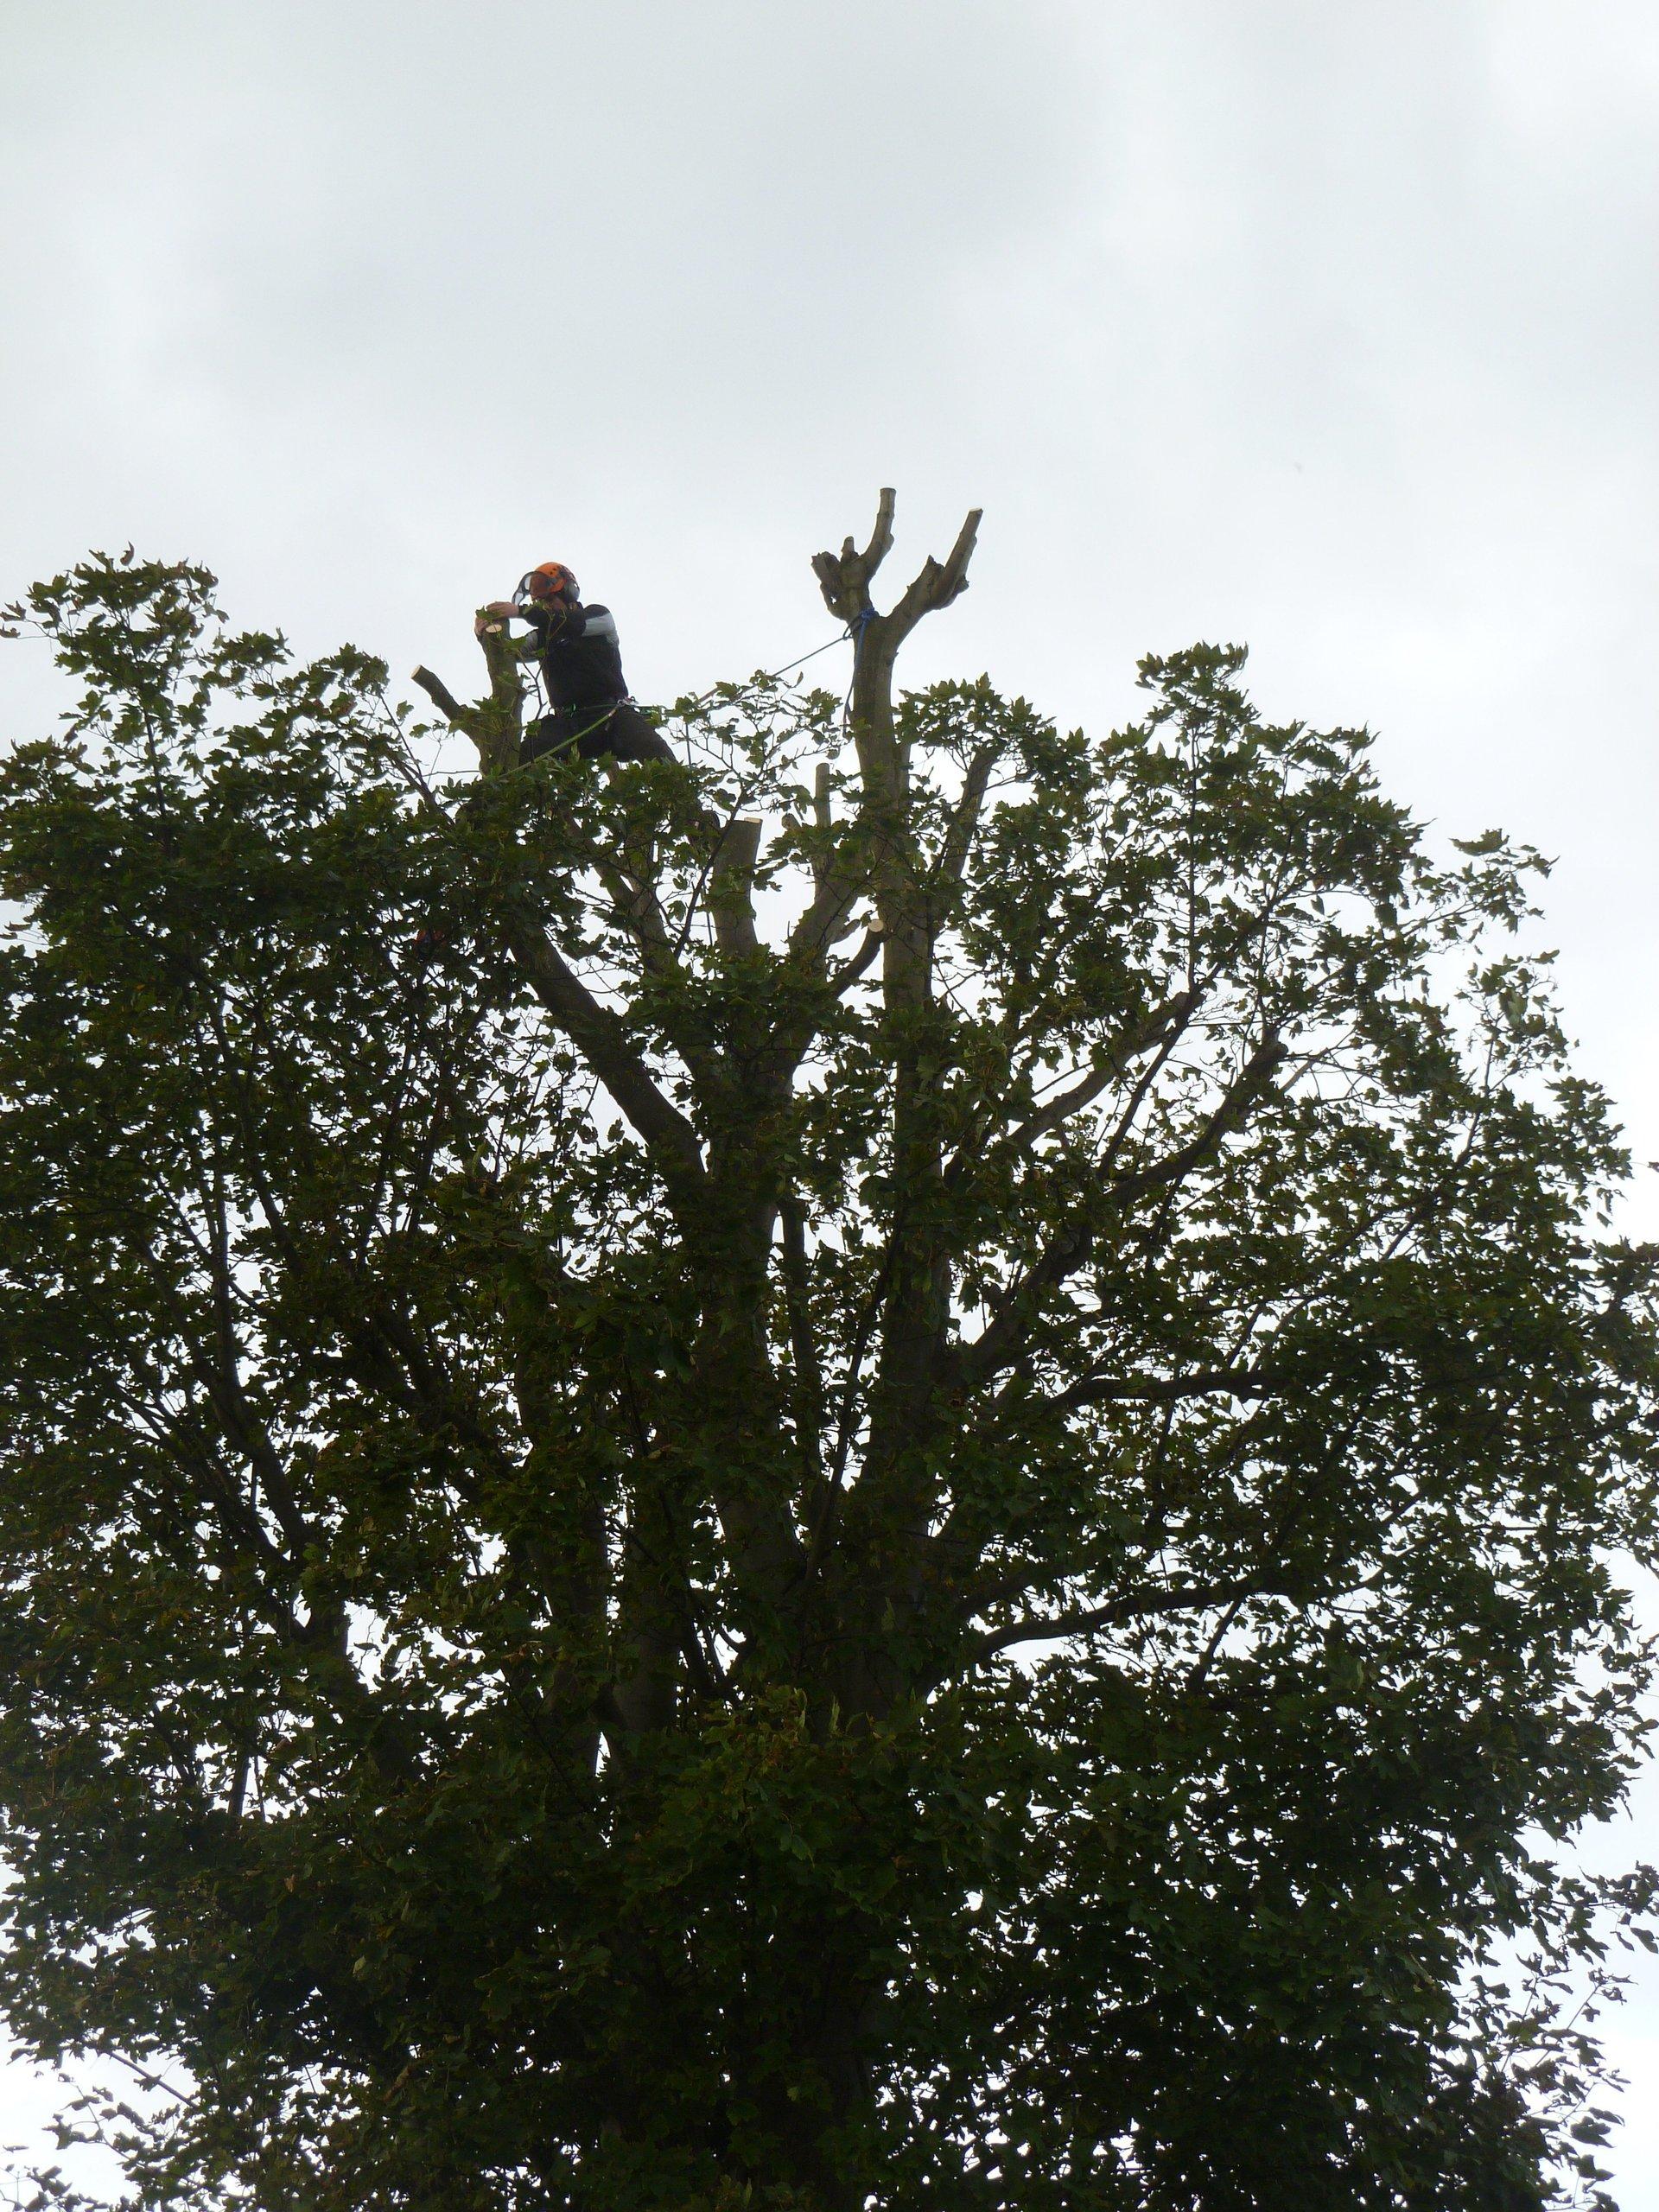 Chestnut tree reduction in Caernarfon, North Wales.